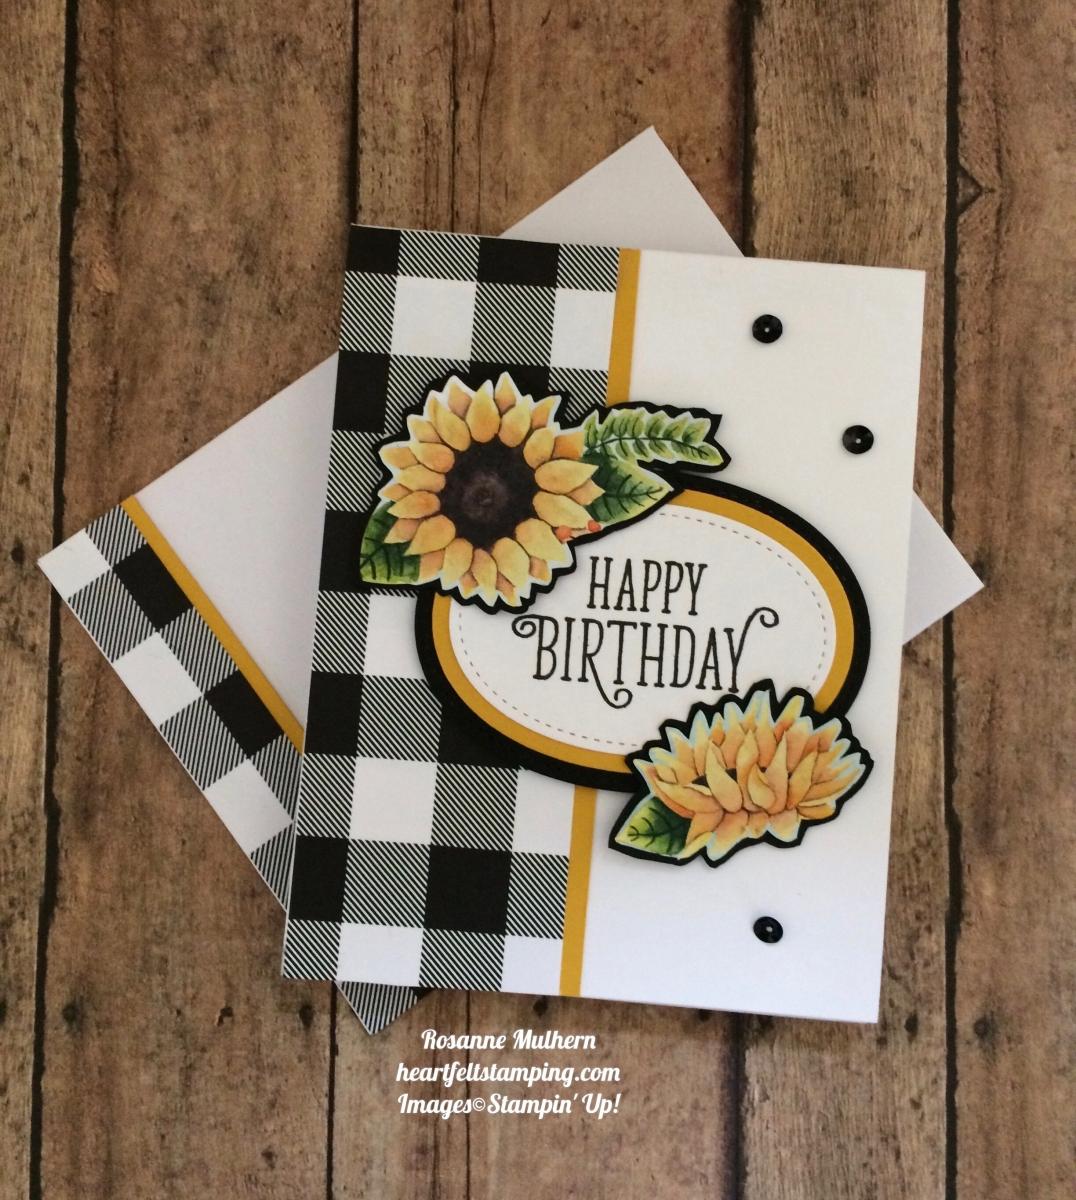 Buffalo Checks Amp Sunflowers Heartfelt Stamping